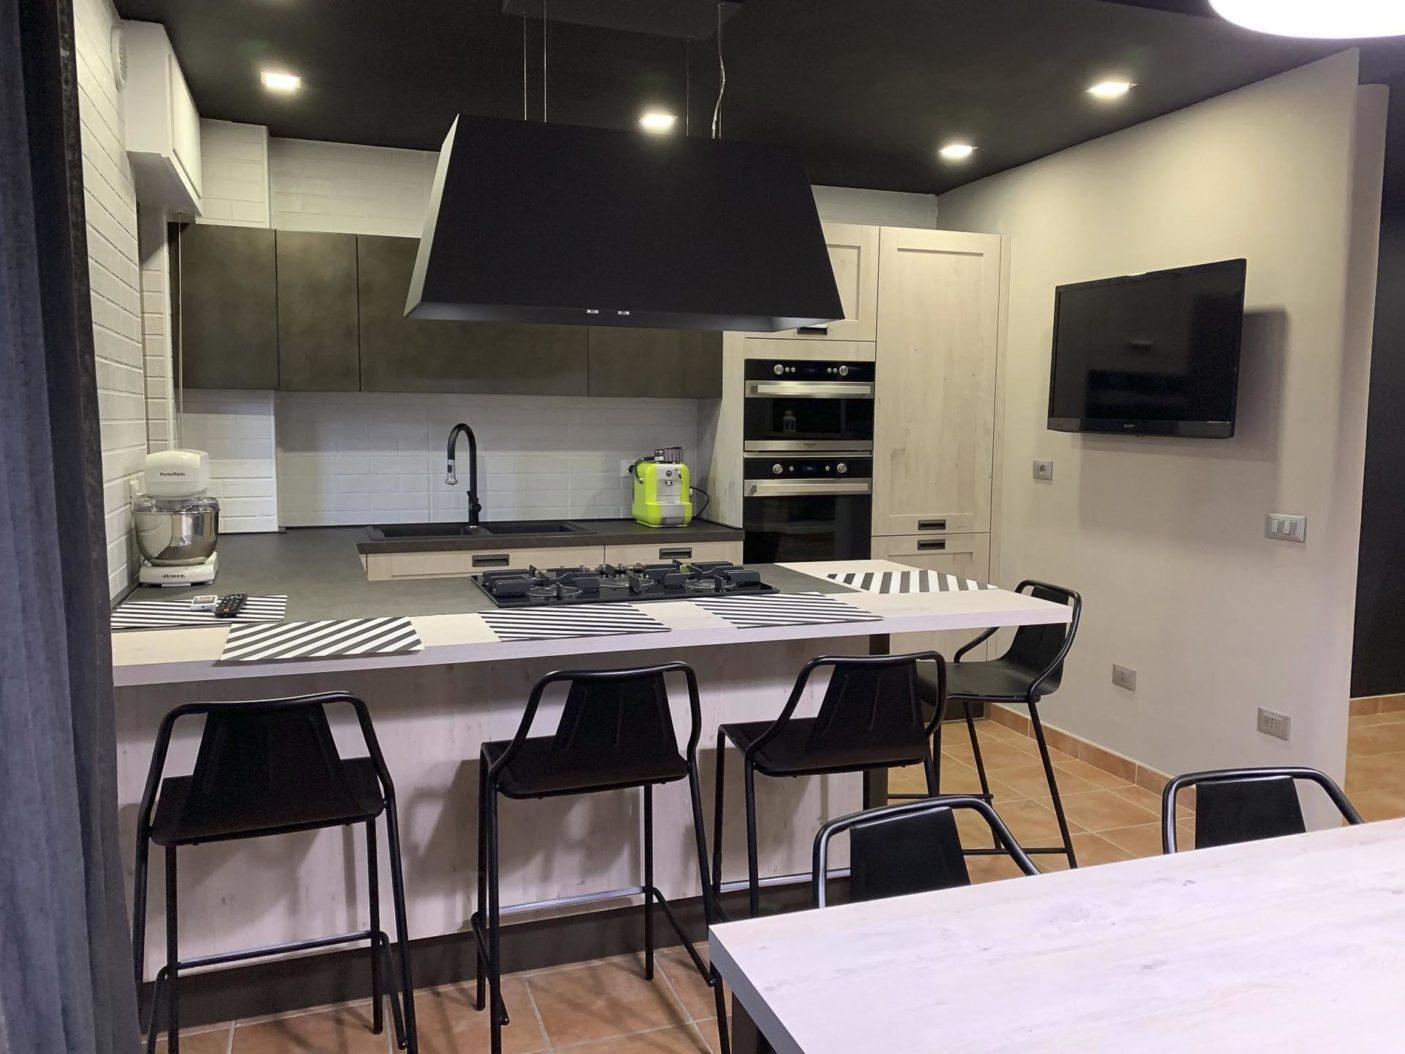 Cucina-Creo-Kitchens-Kyra-a-Telaio2.jpg